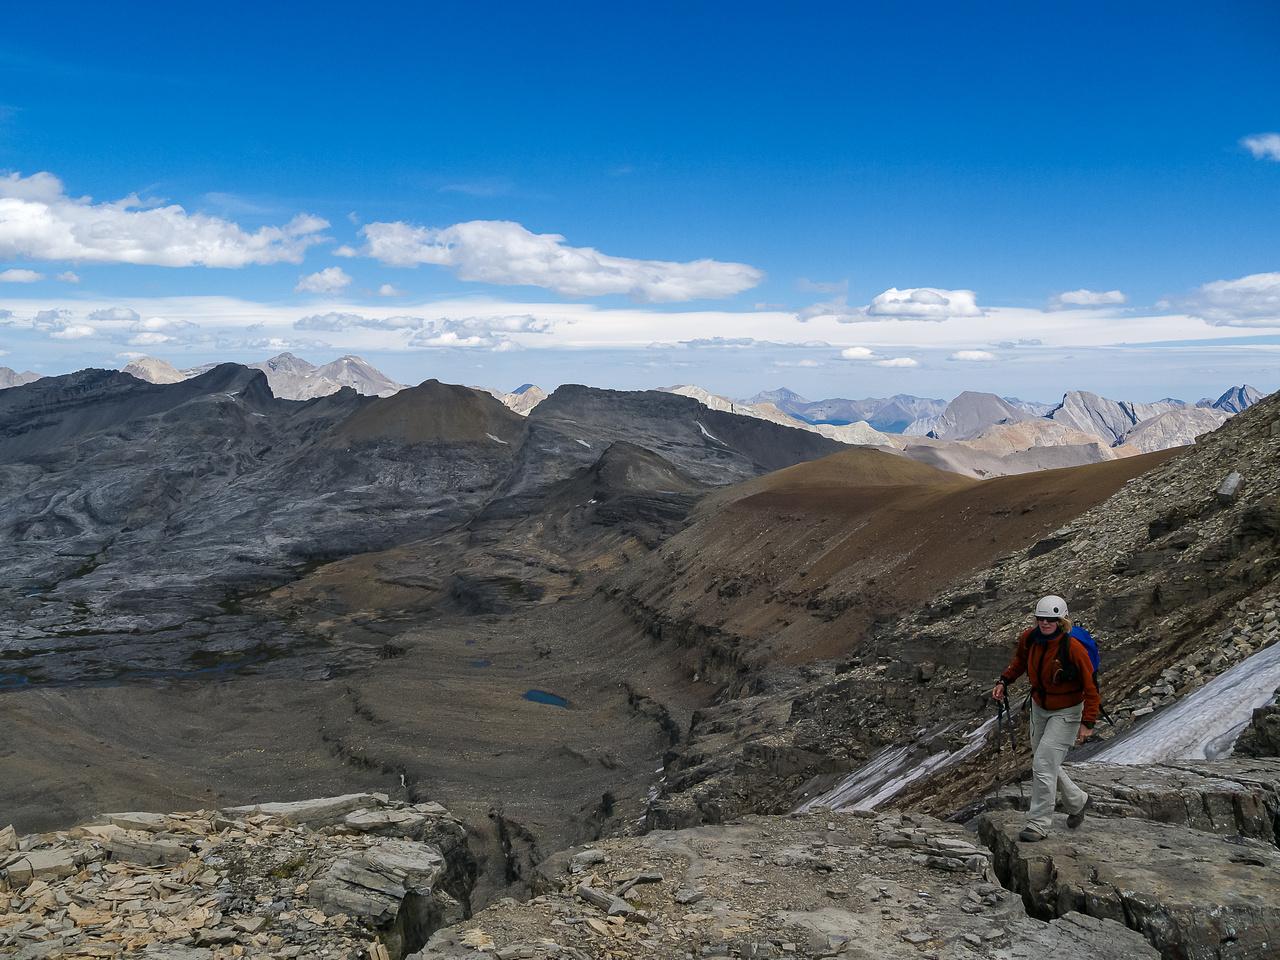 The ridge has some very interesting terrain.